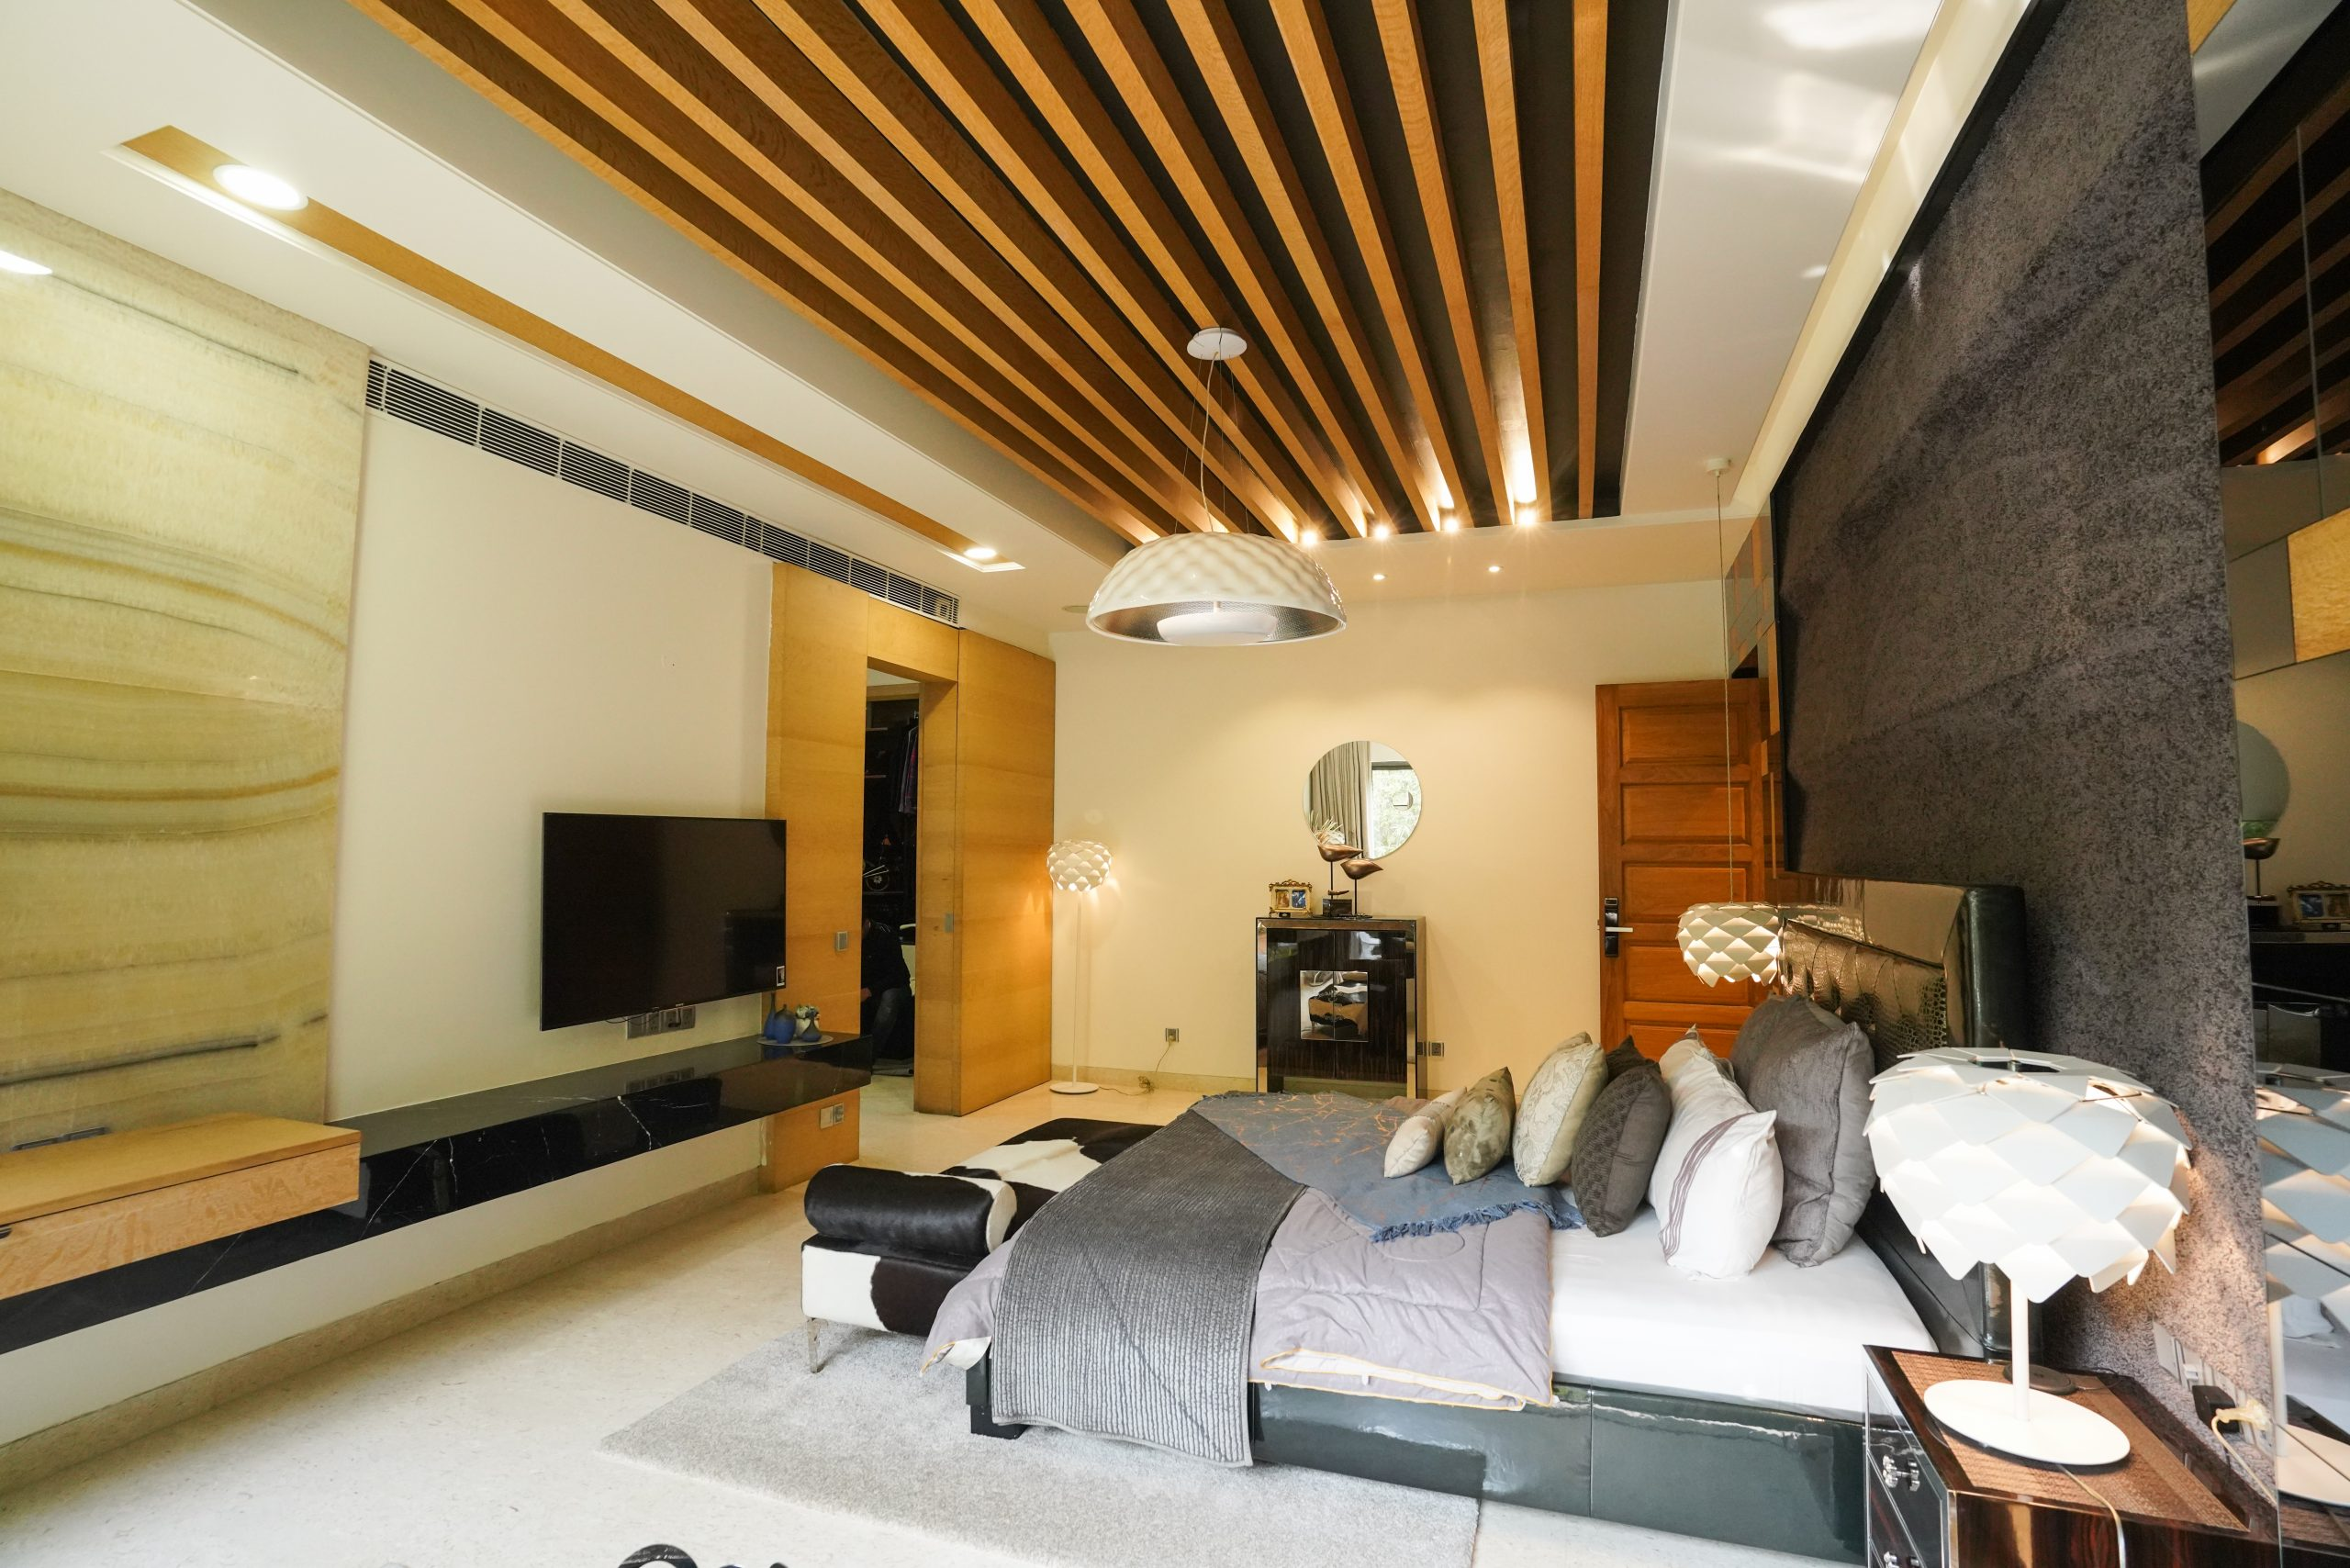 Interior designing of a bedroom